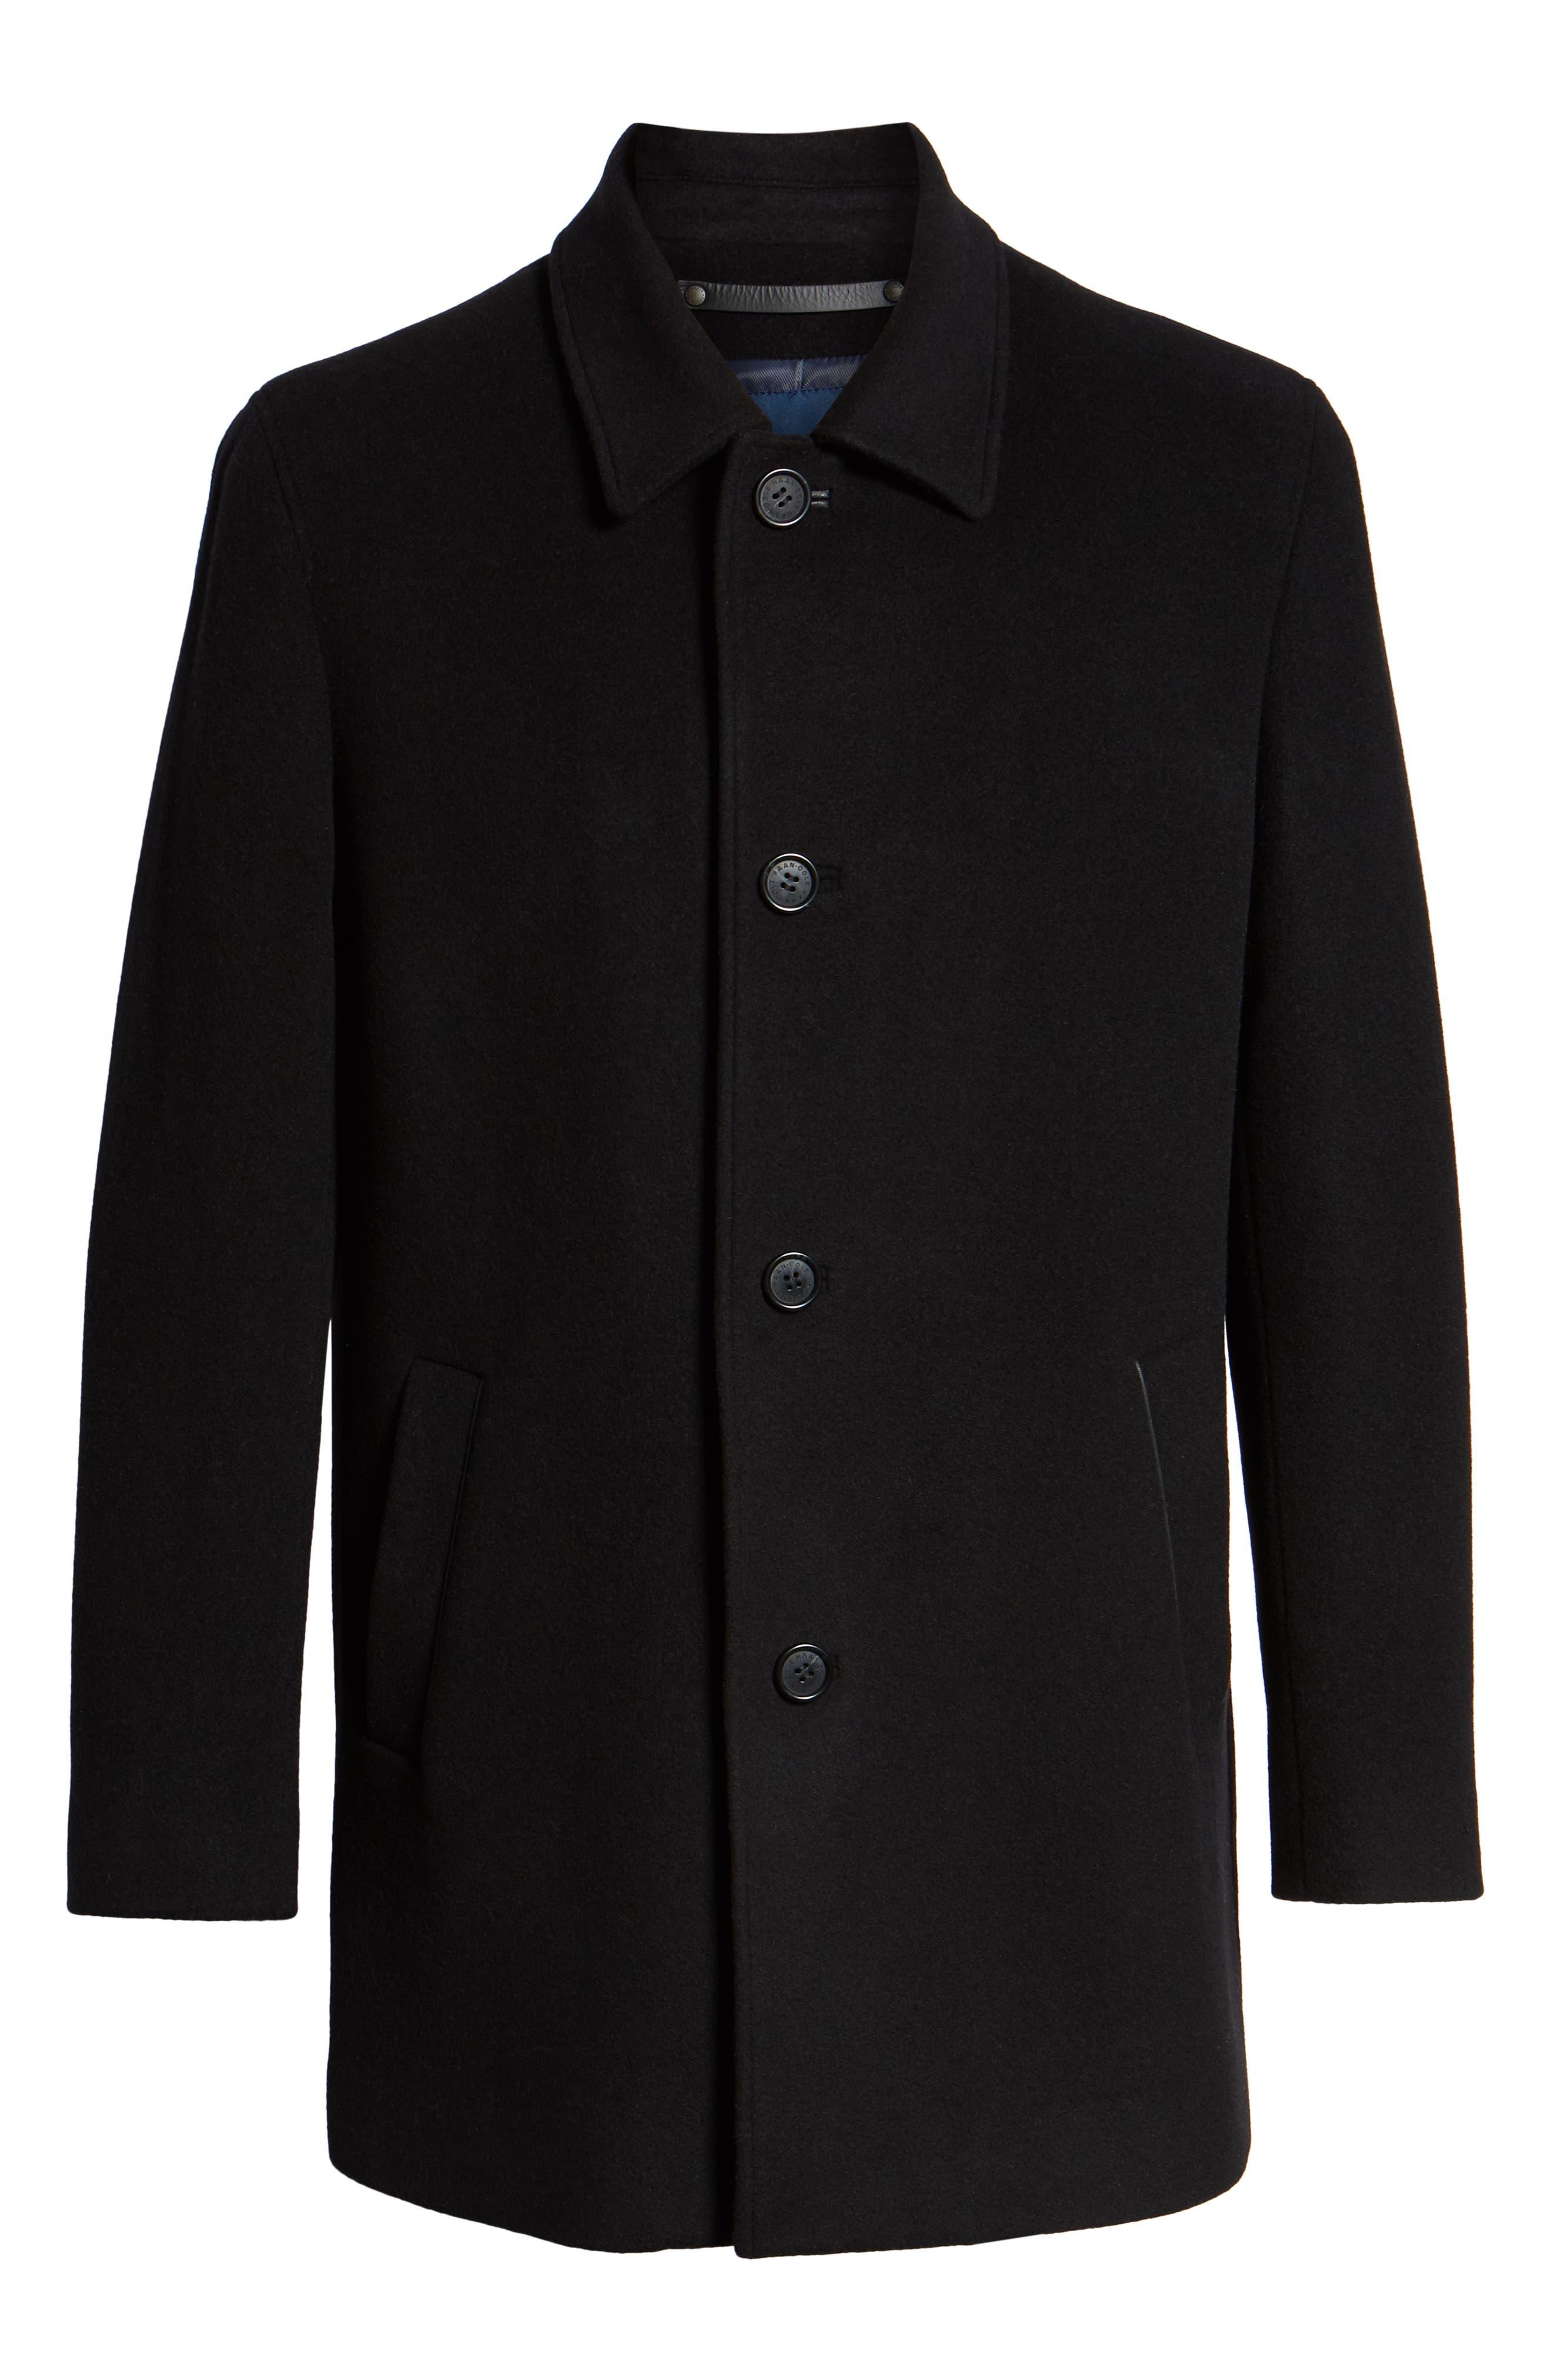 COLE HAAN, Italian Wool Blend Overcoat, Alternate thumbnail 6, color, 001